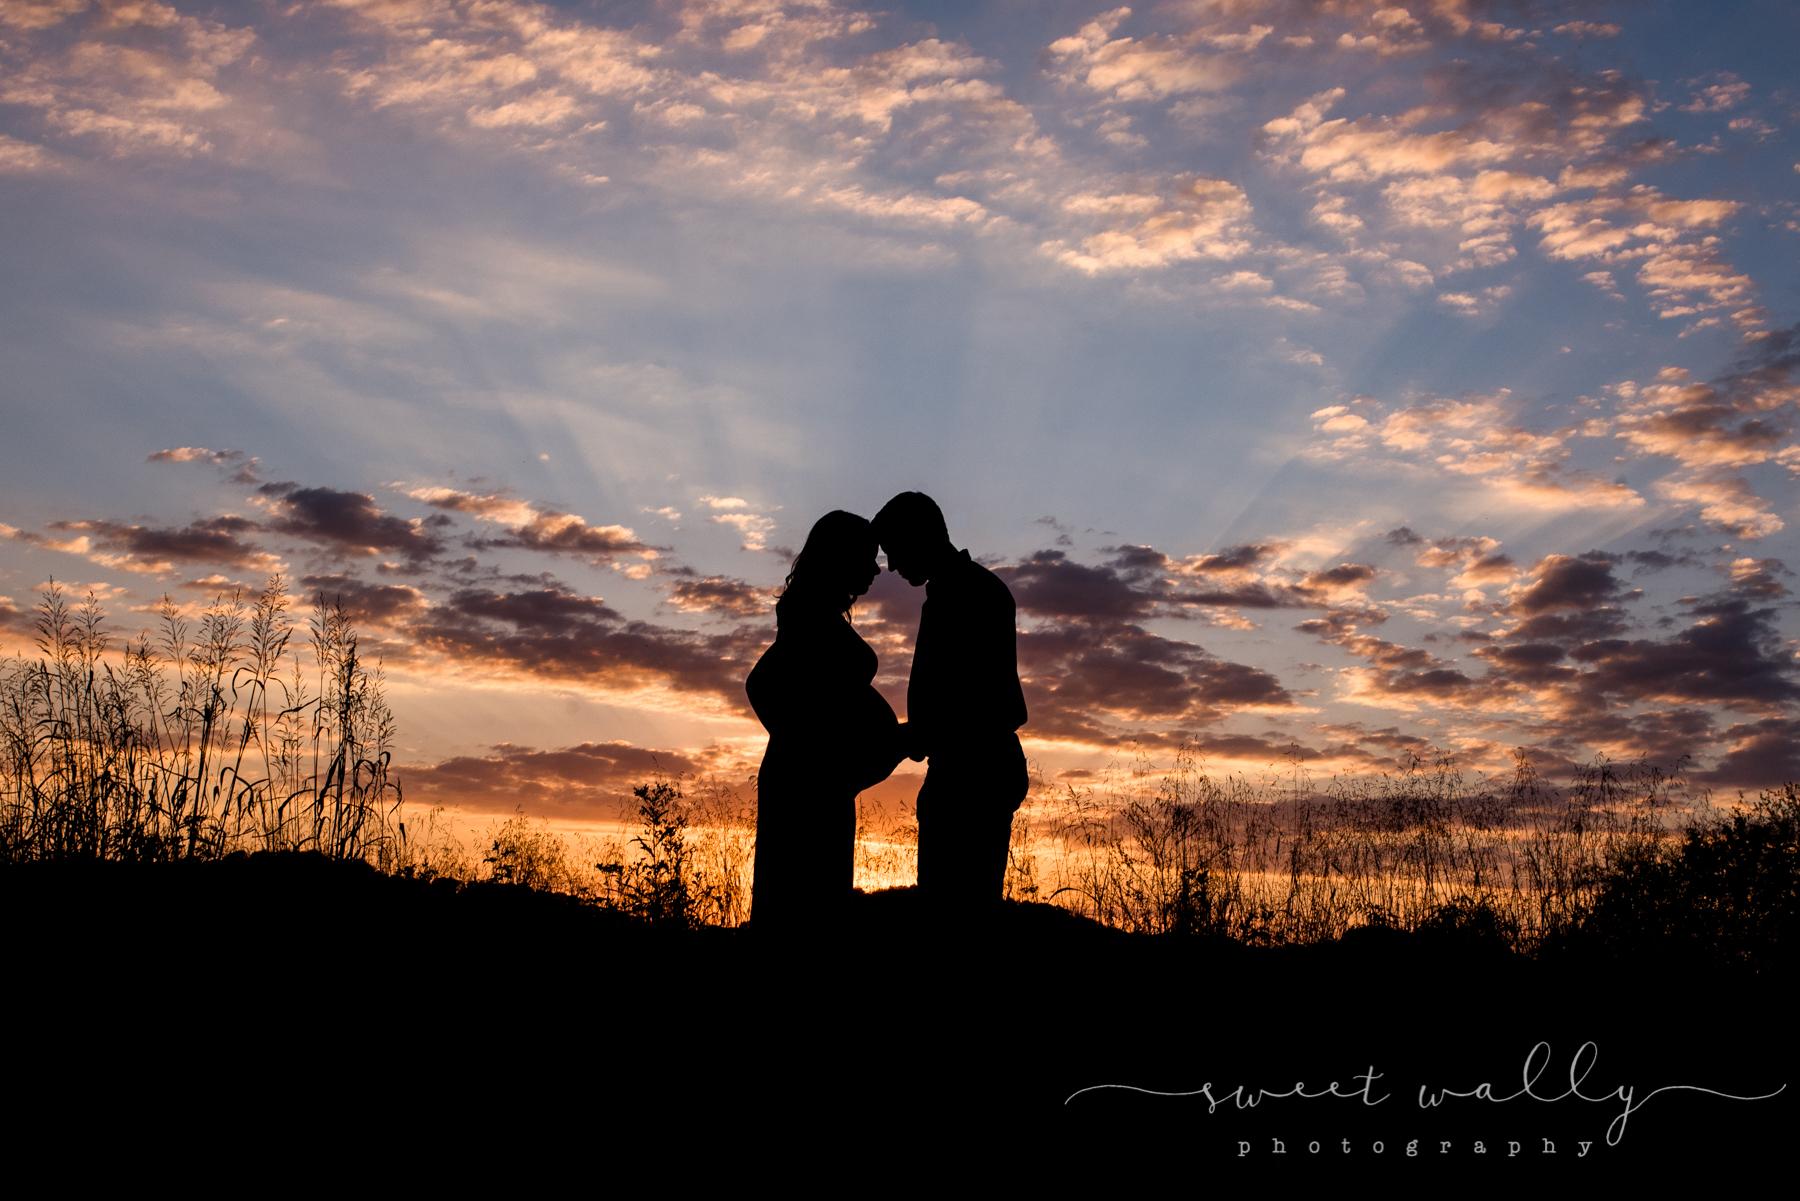 Baby bump silhouette | Sweet Wally Photography | Maternity Photographer | Nashville, TN